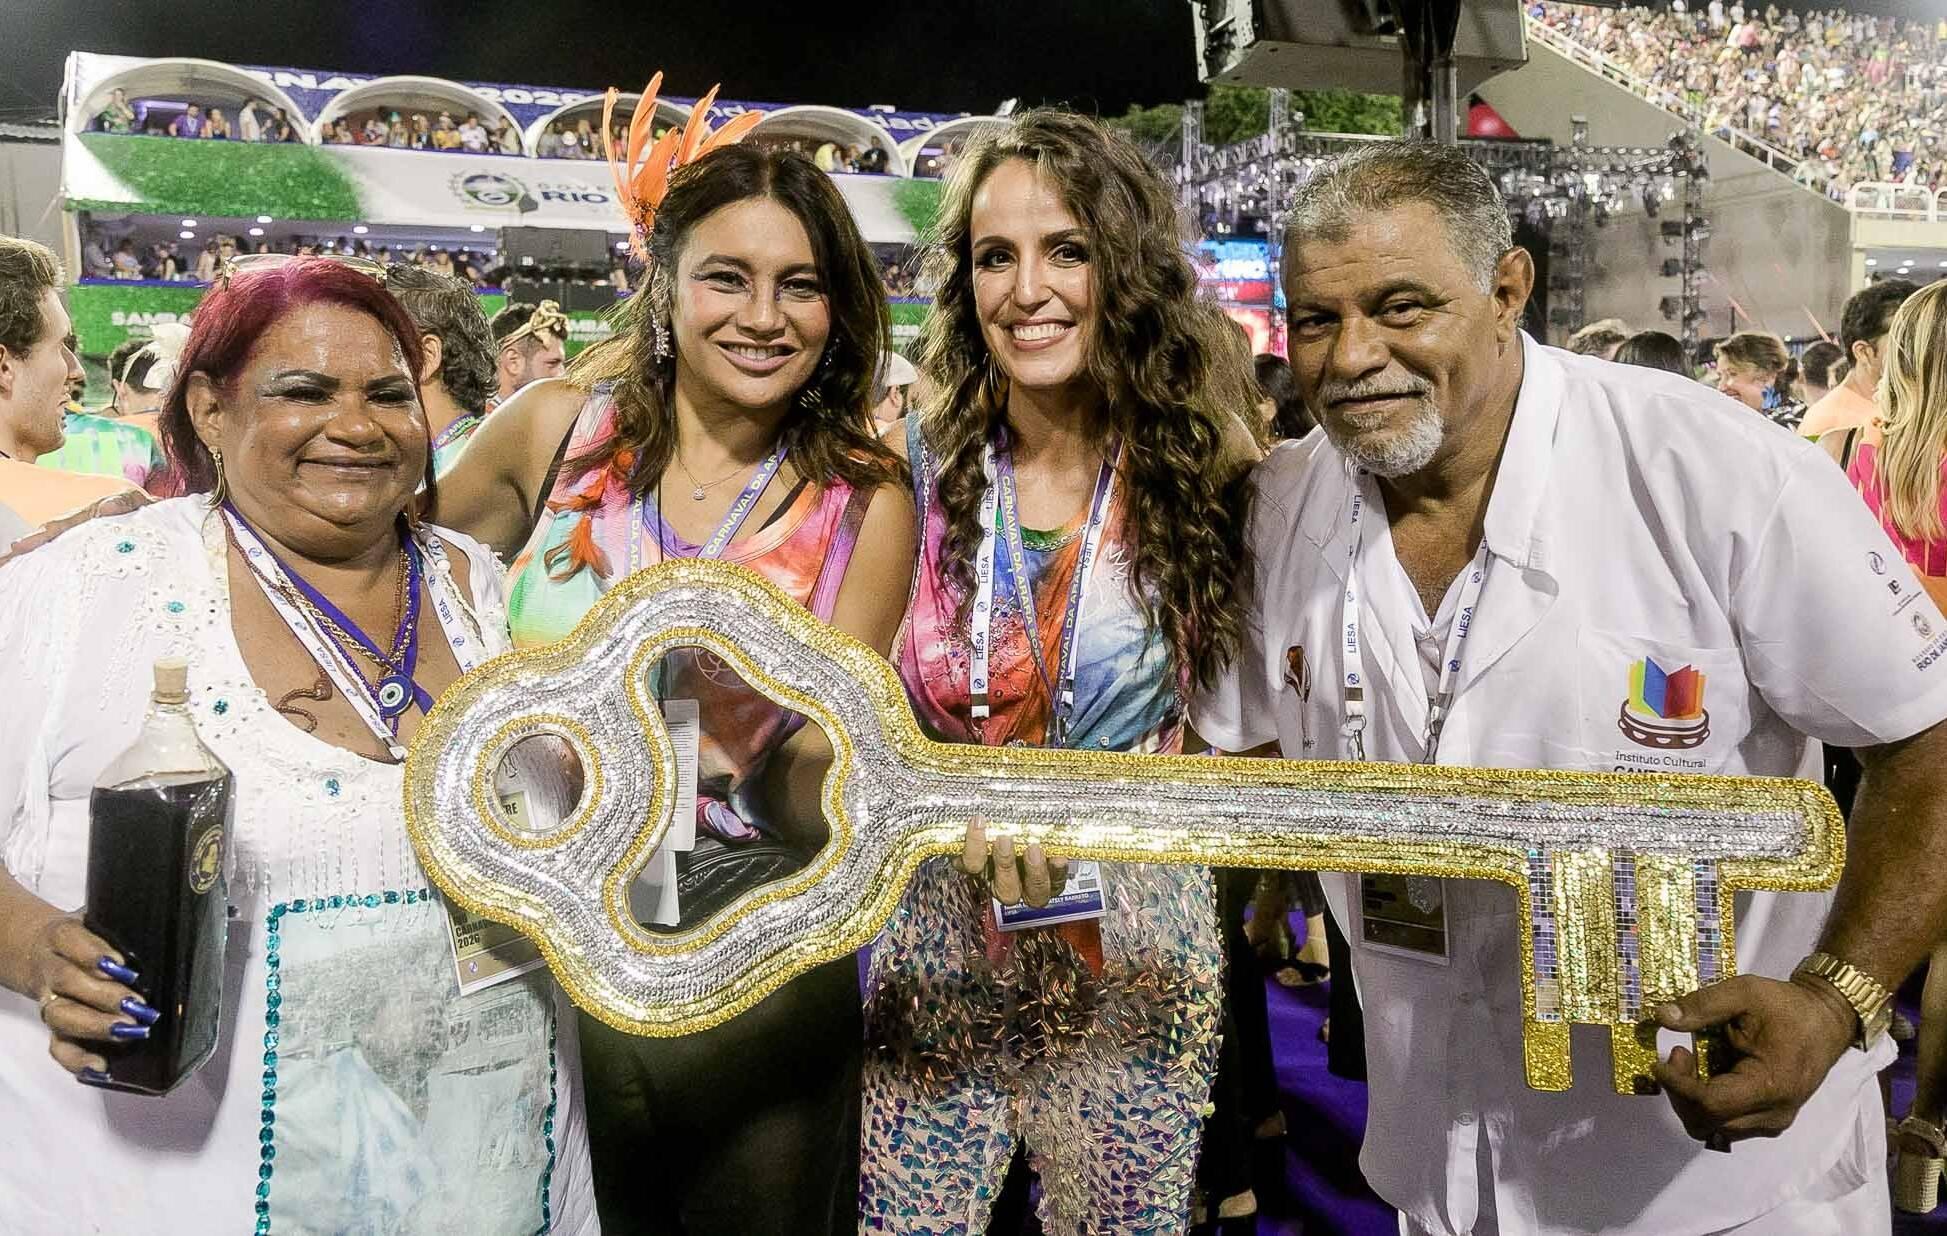 Cristina de Jesus, Dira Paes, Malu Barretto e Mauricio Jesus  /Foto: Bruno Ryfer